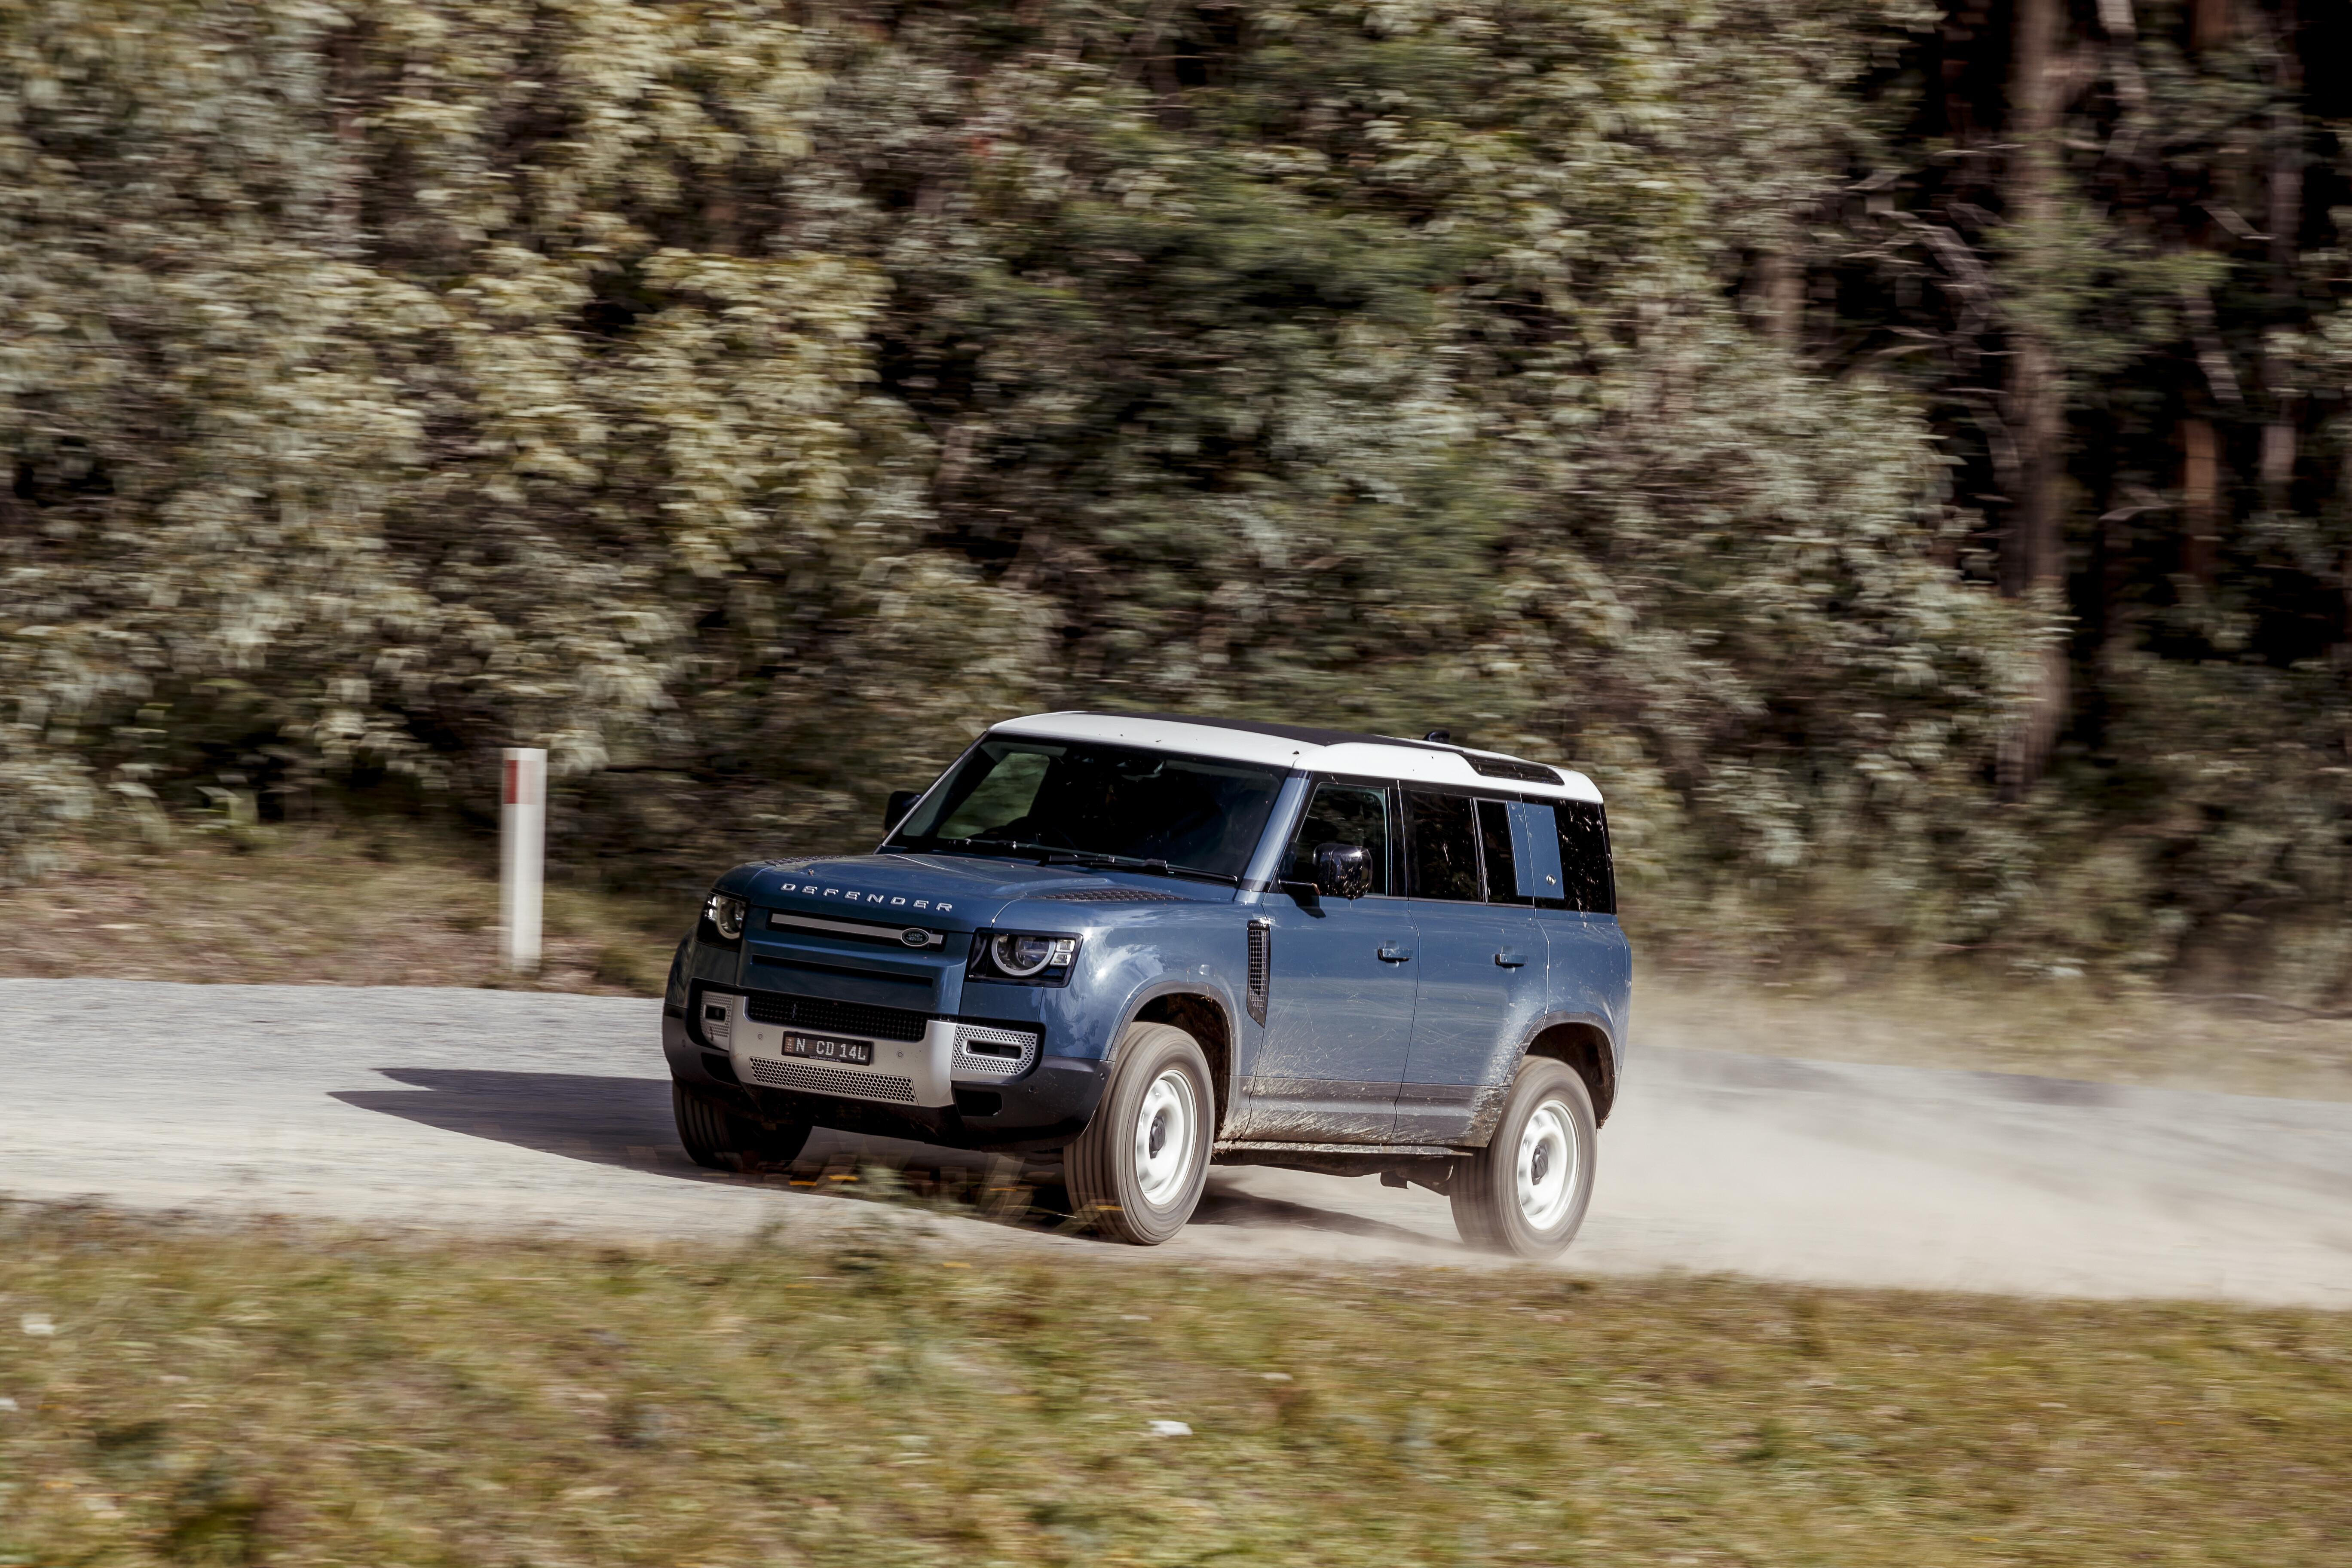 4 X 4 Australia Reviews 2021 June 2021 2021 Land Rover Defender 110 D 250 S 3